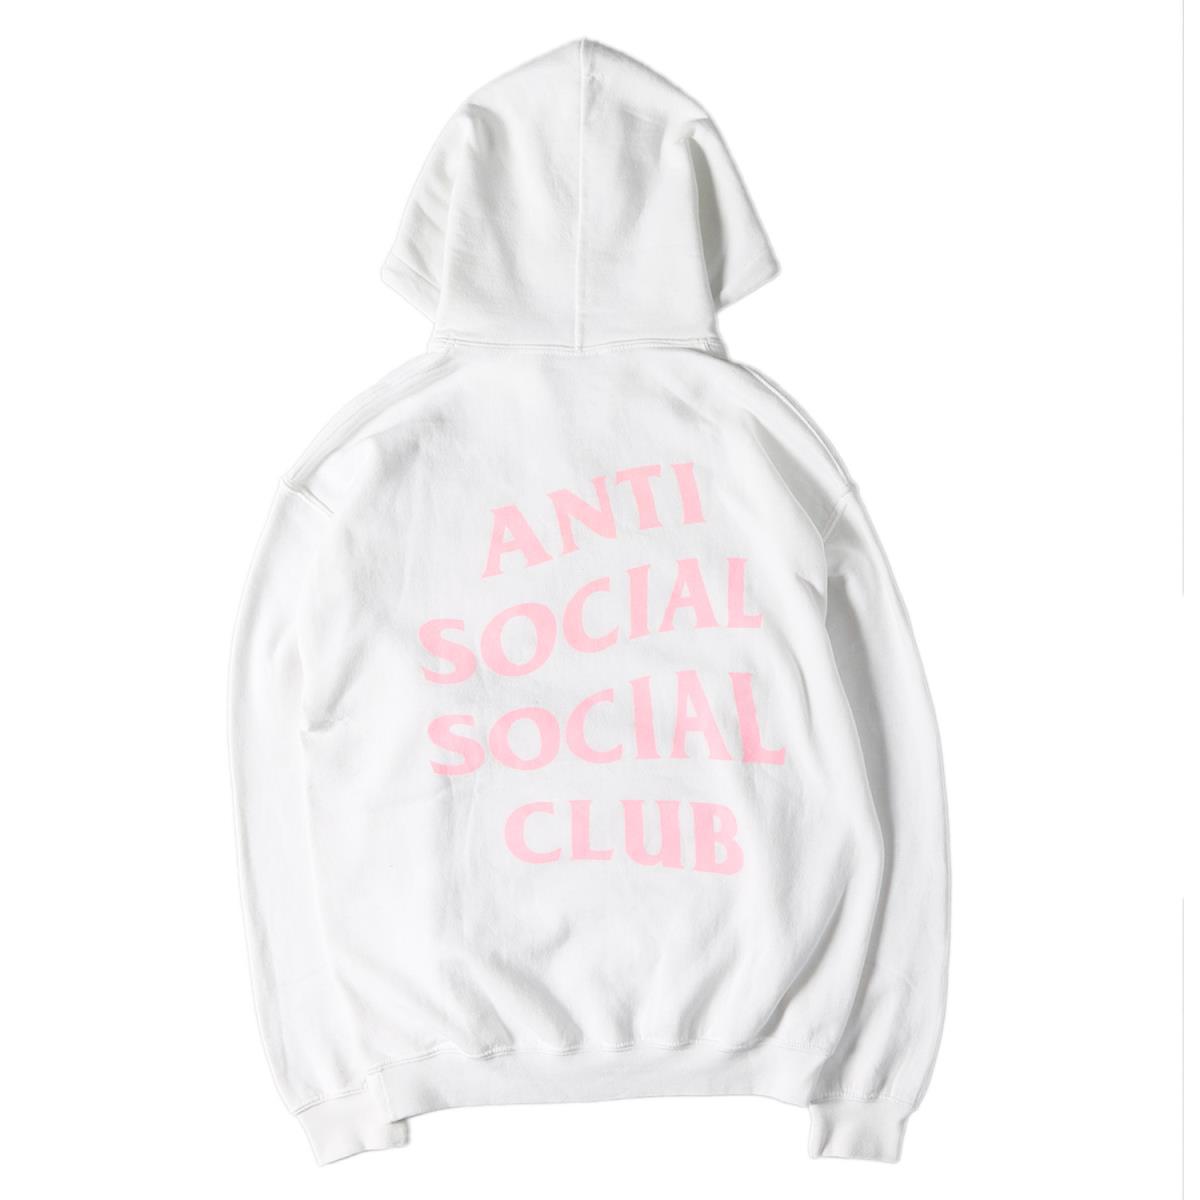 Anti Social Social Club (アンチ ソーシャル ソーシャル クラブ) ブランドロゴプスウェットパーカー ホワイト×ピンク M 【メンズ】【K2229】【中古】【あす楽☆対応可】